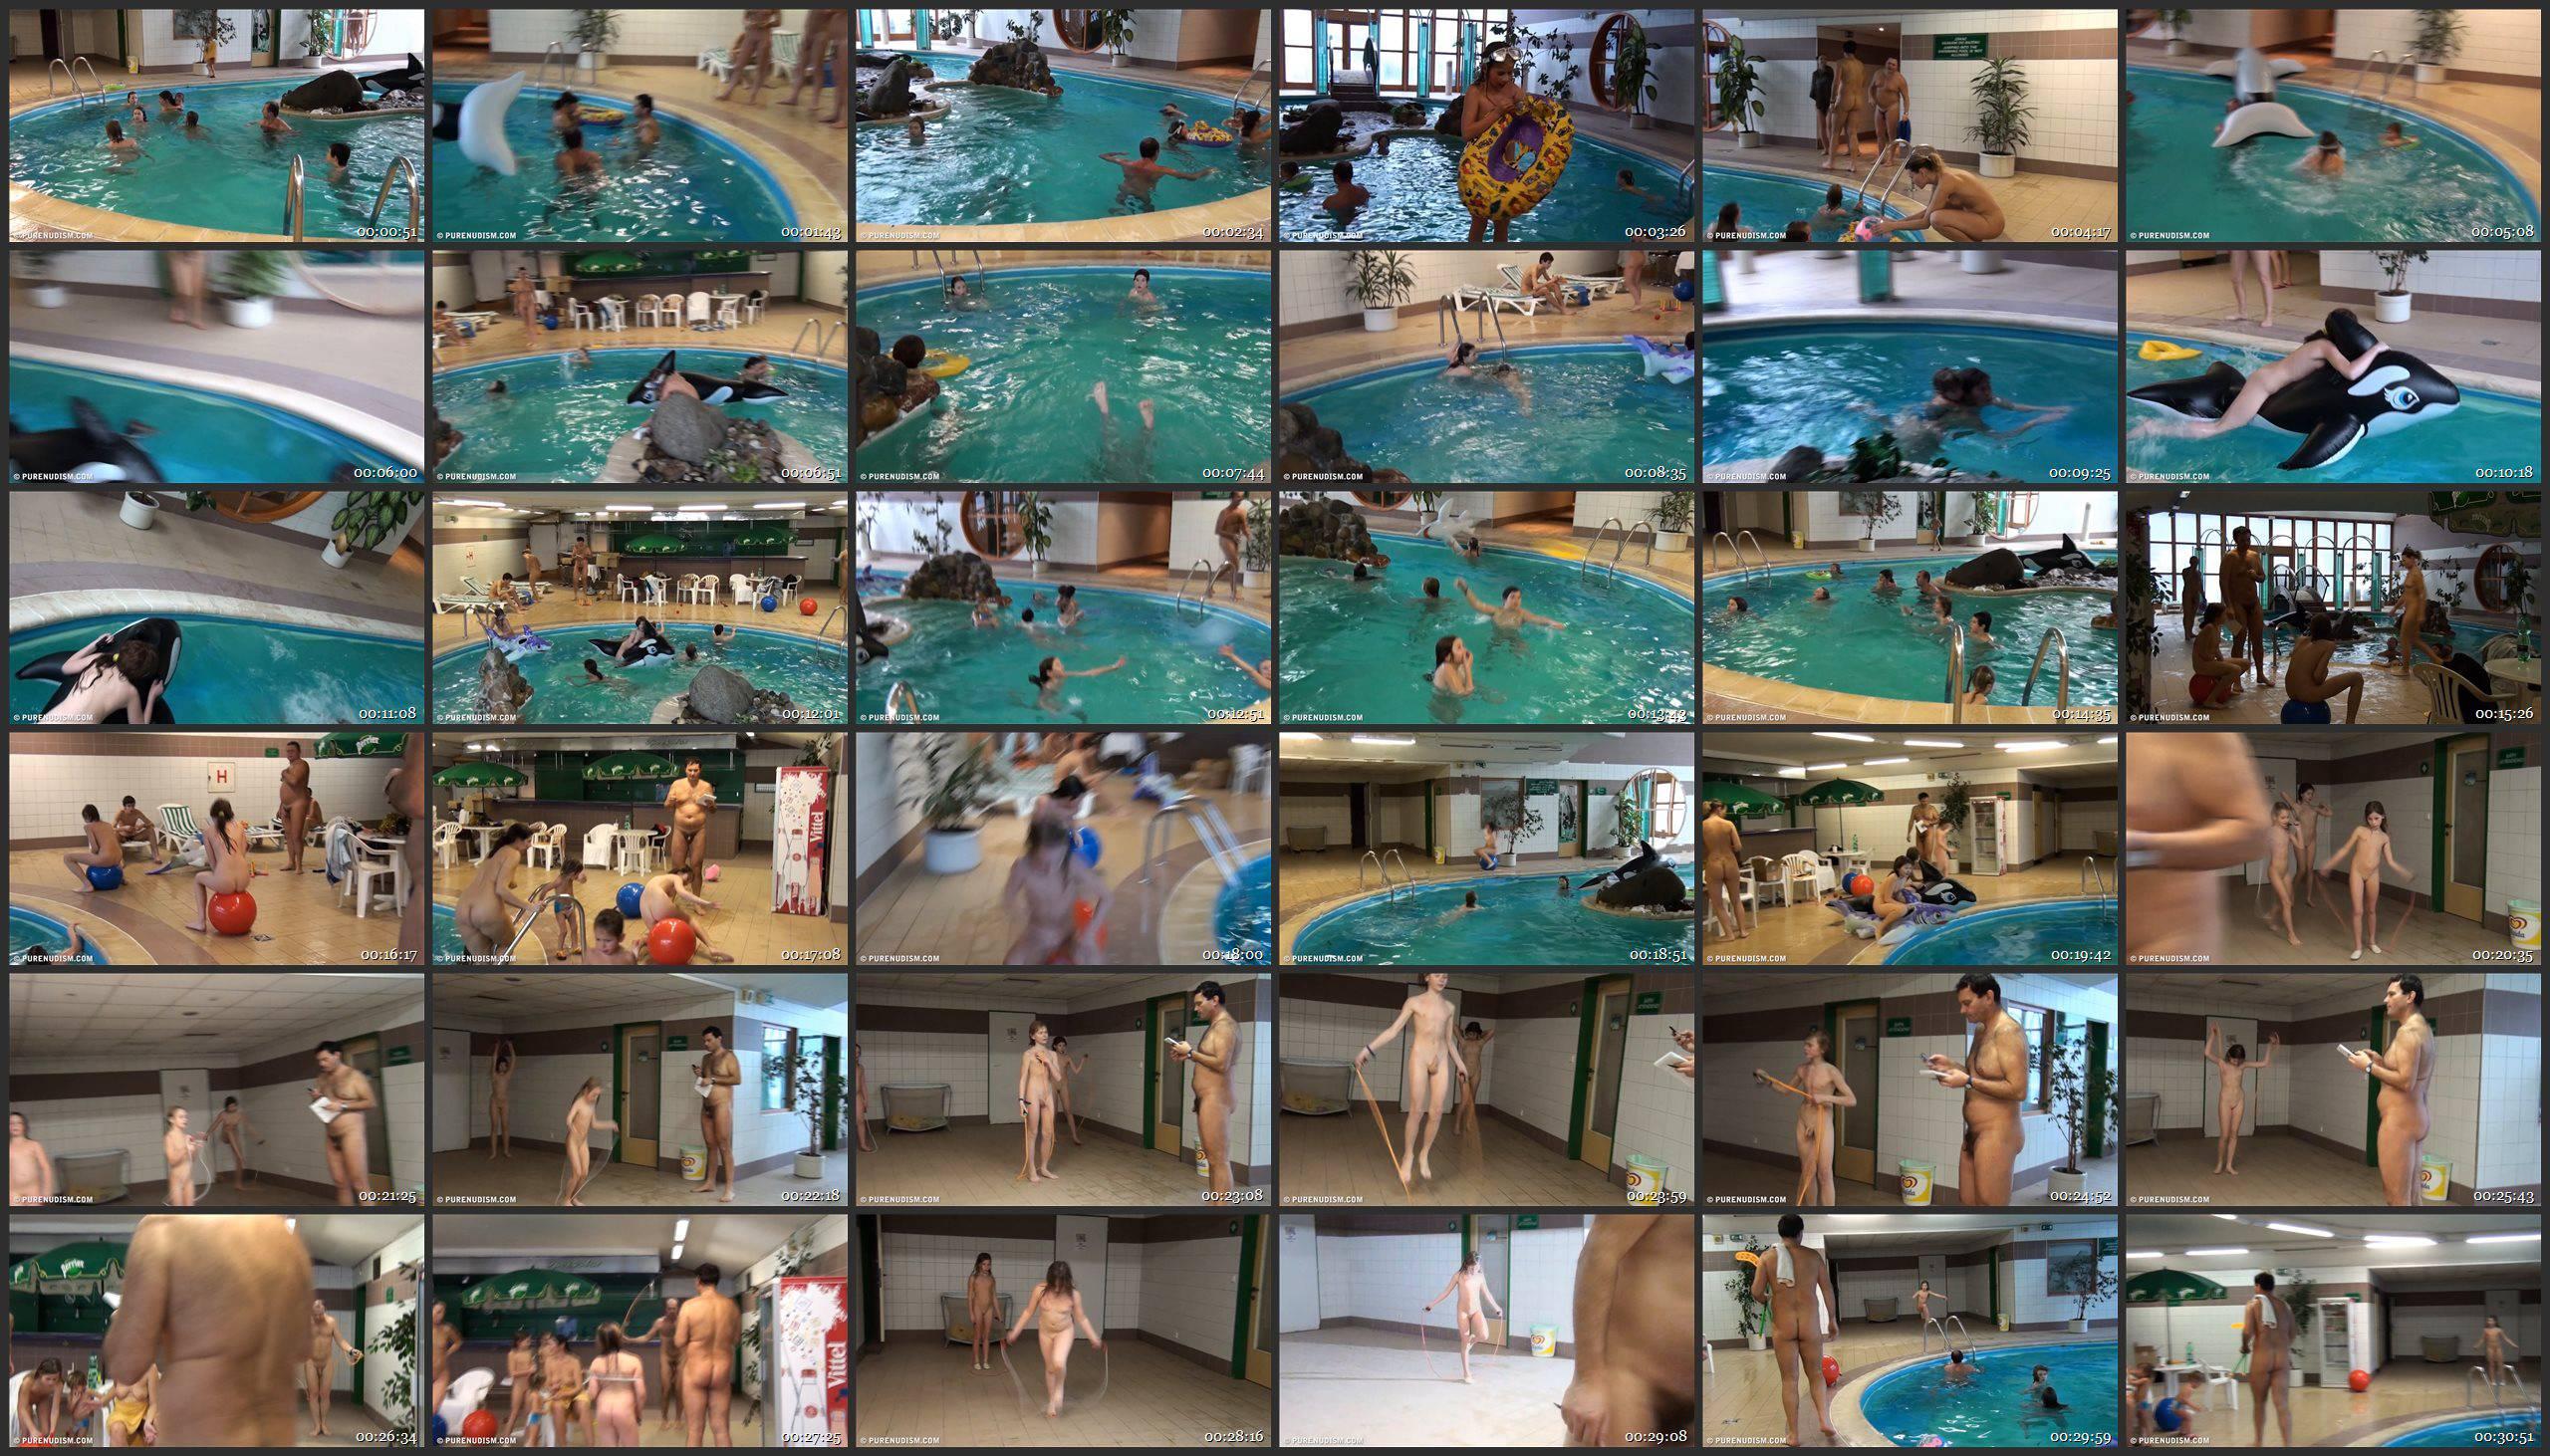 Kids Indoor Dolphin Ride - Thumbnails